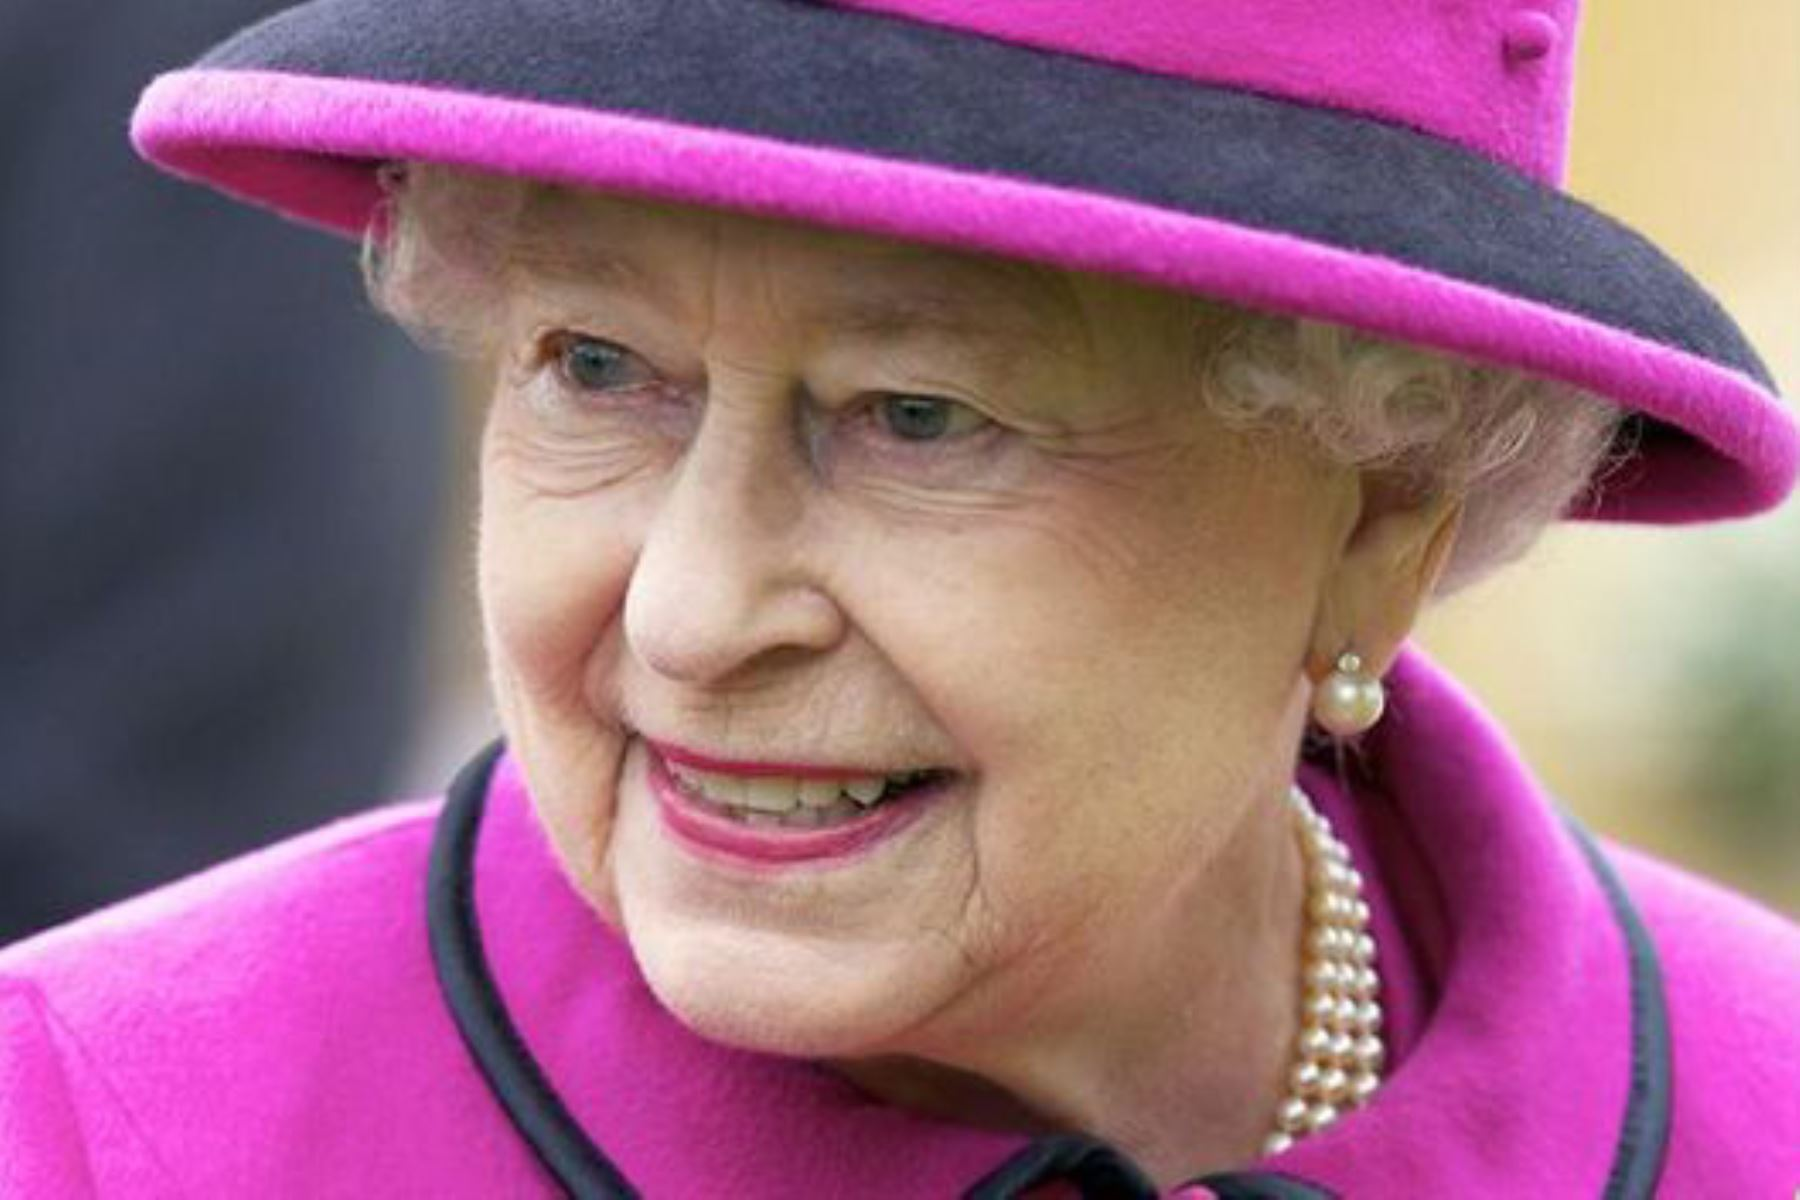 La reina Isabel II desea buena suerte a Inglaterra antes de la final de la Eurocopa